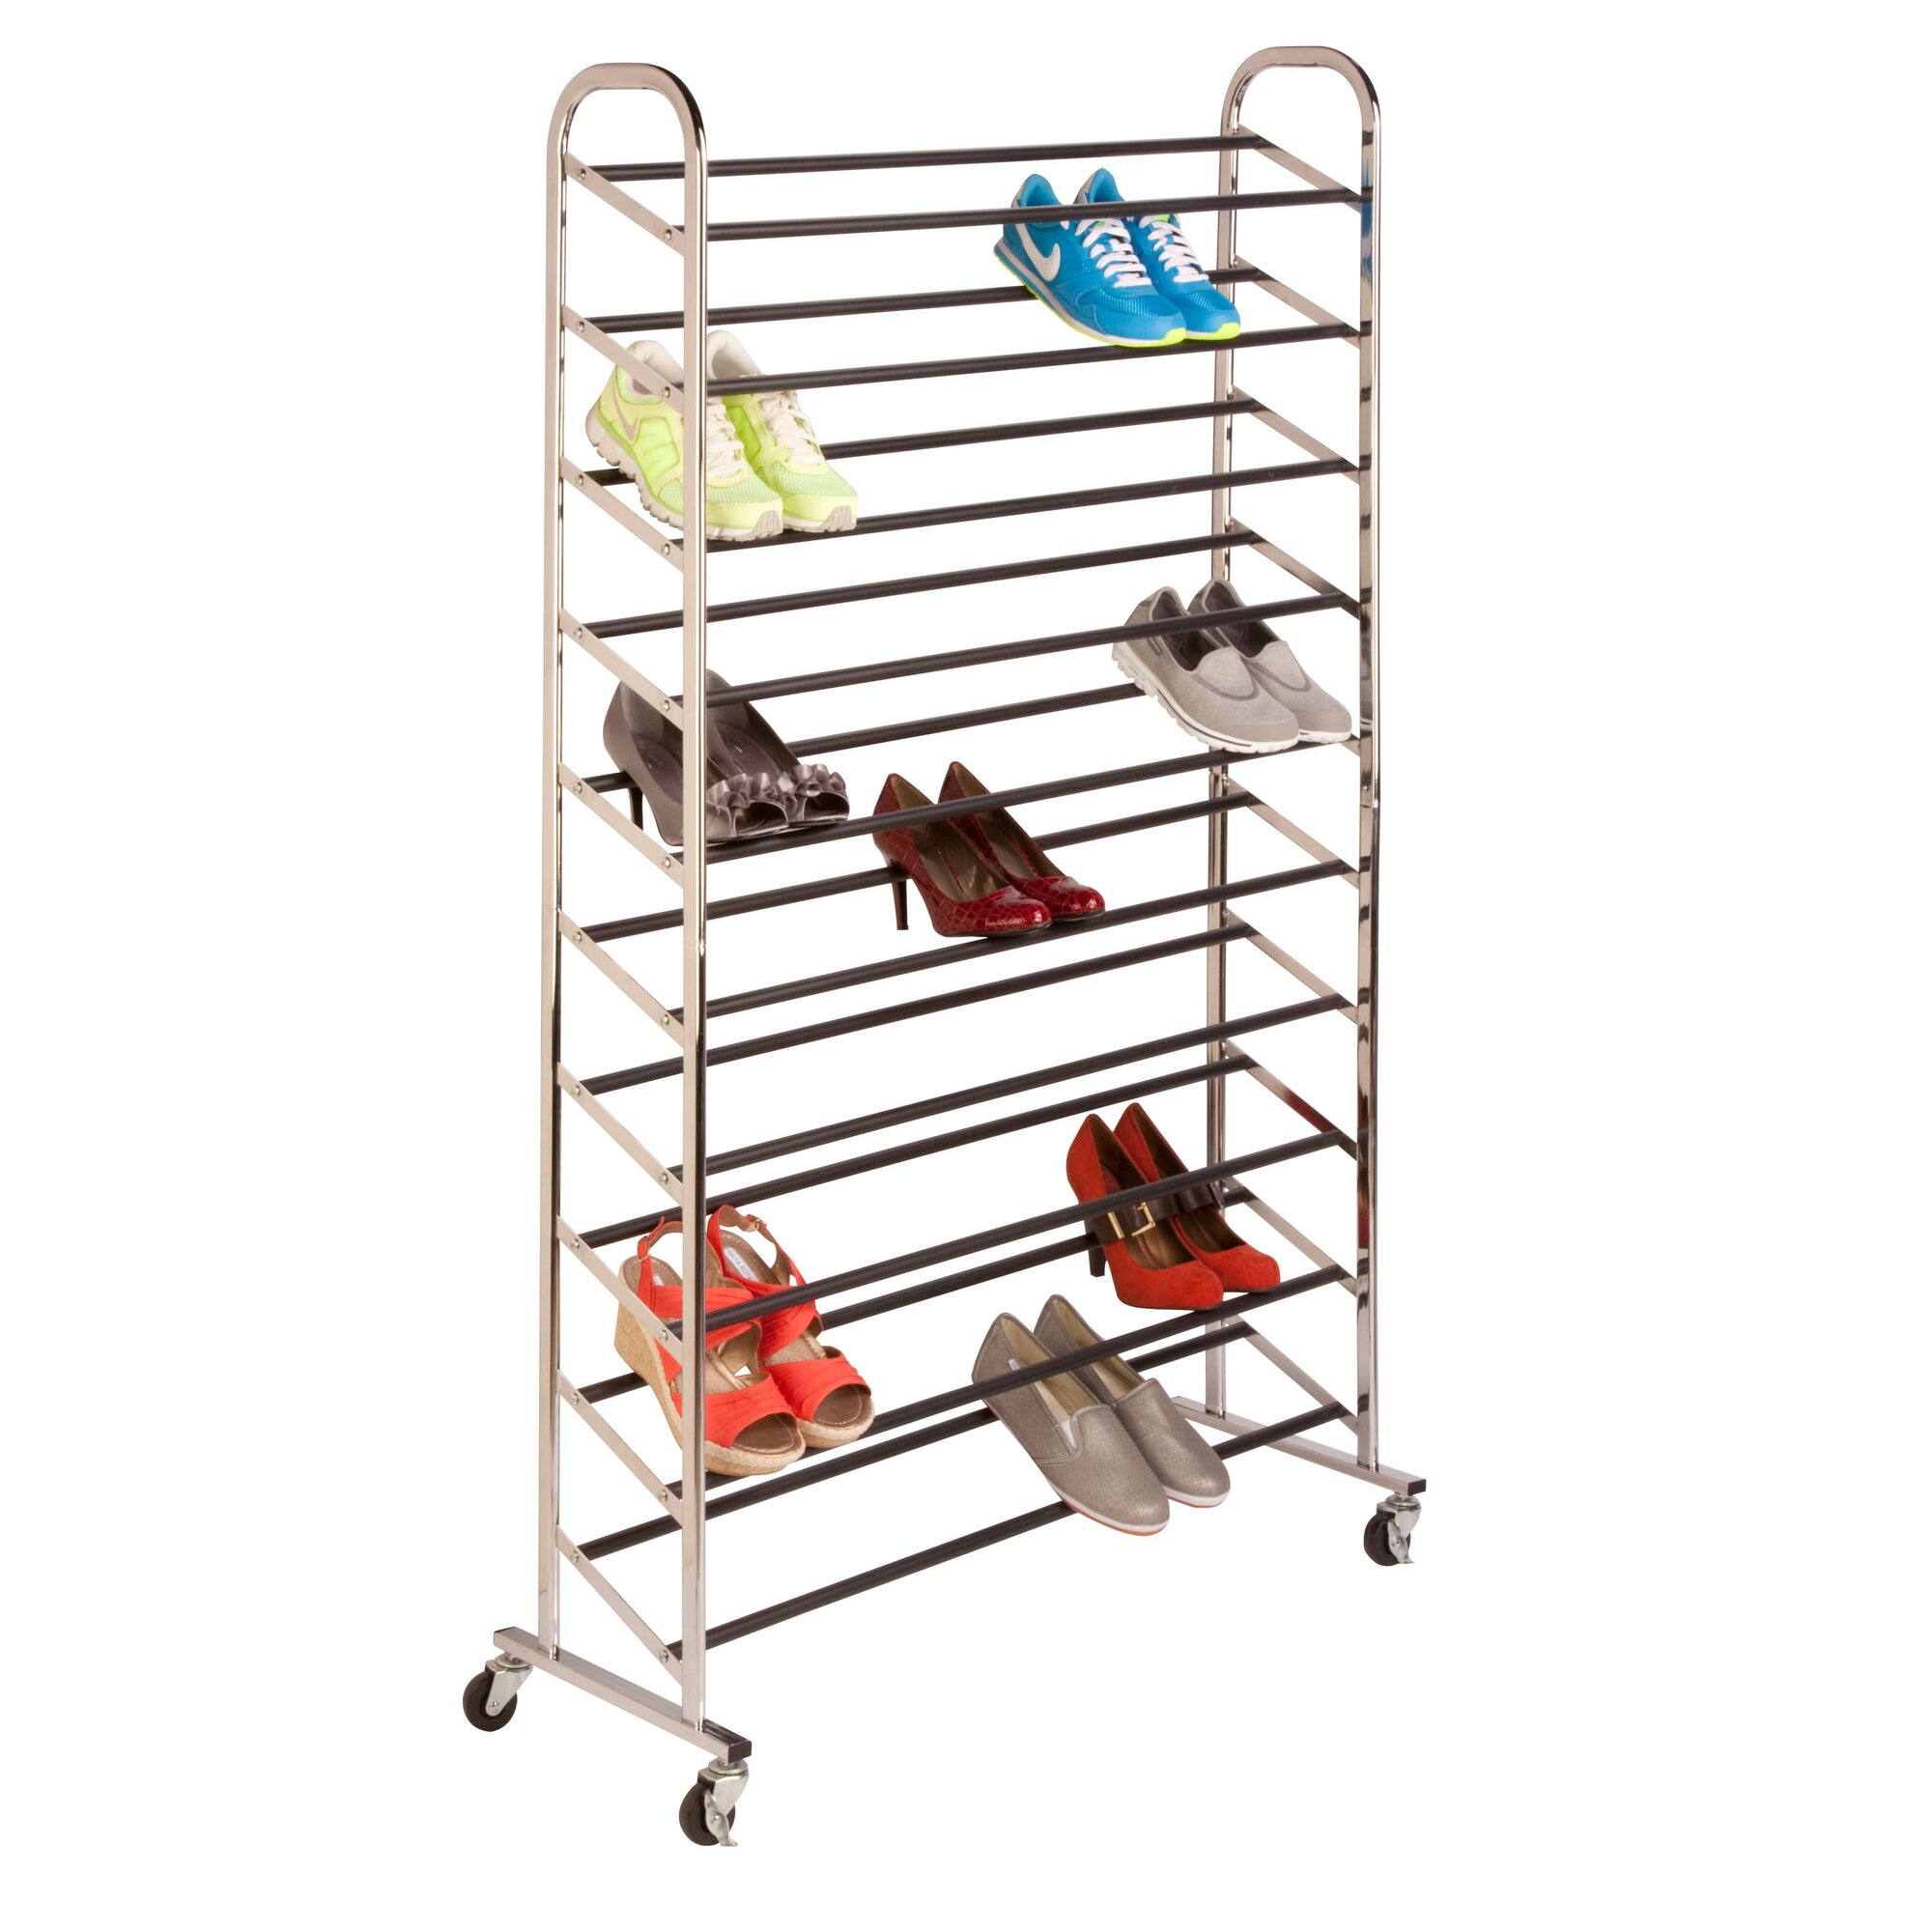 wayfair basics wayfair basics rolling 10 tier shoe rack reviews. Black Bedroom Furniture Sets. Home Design Ideas